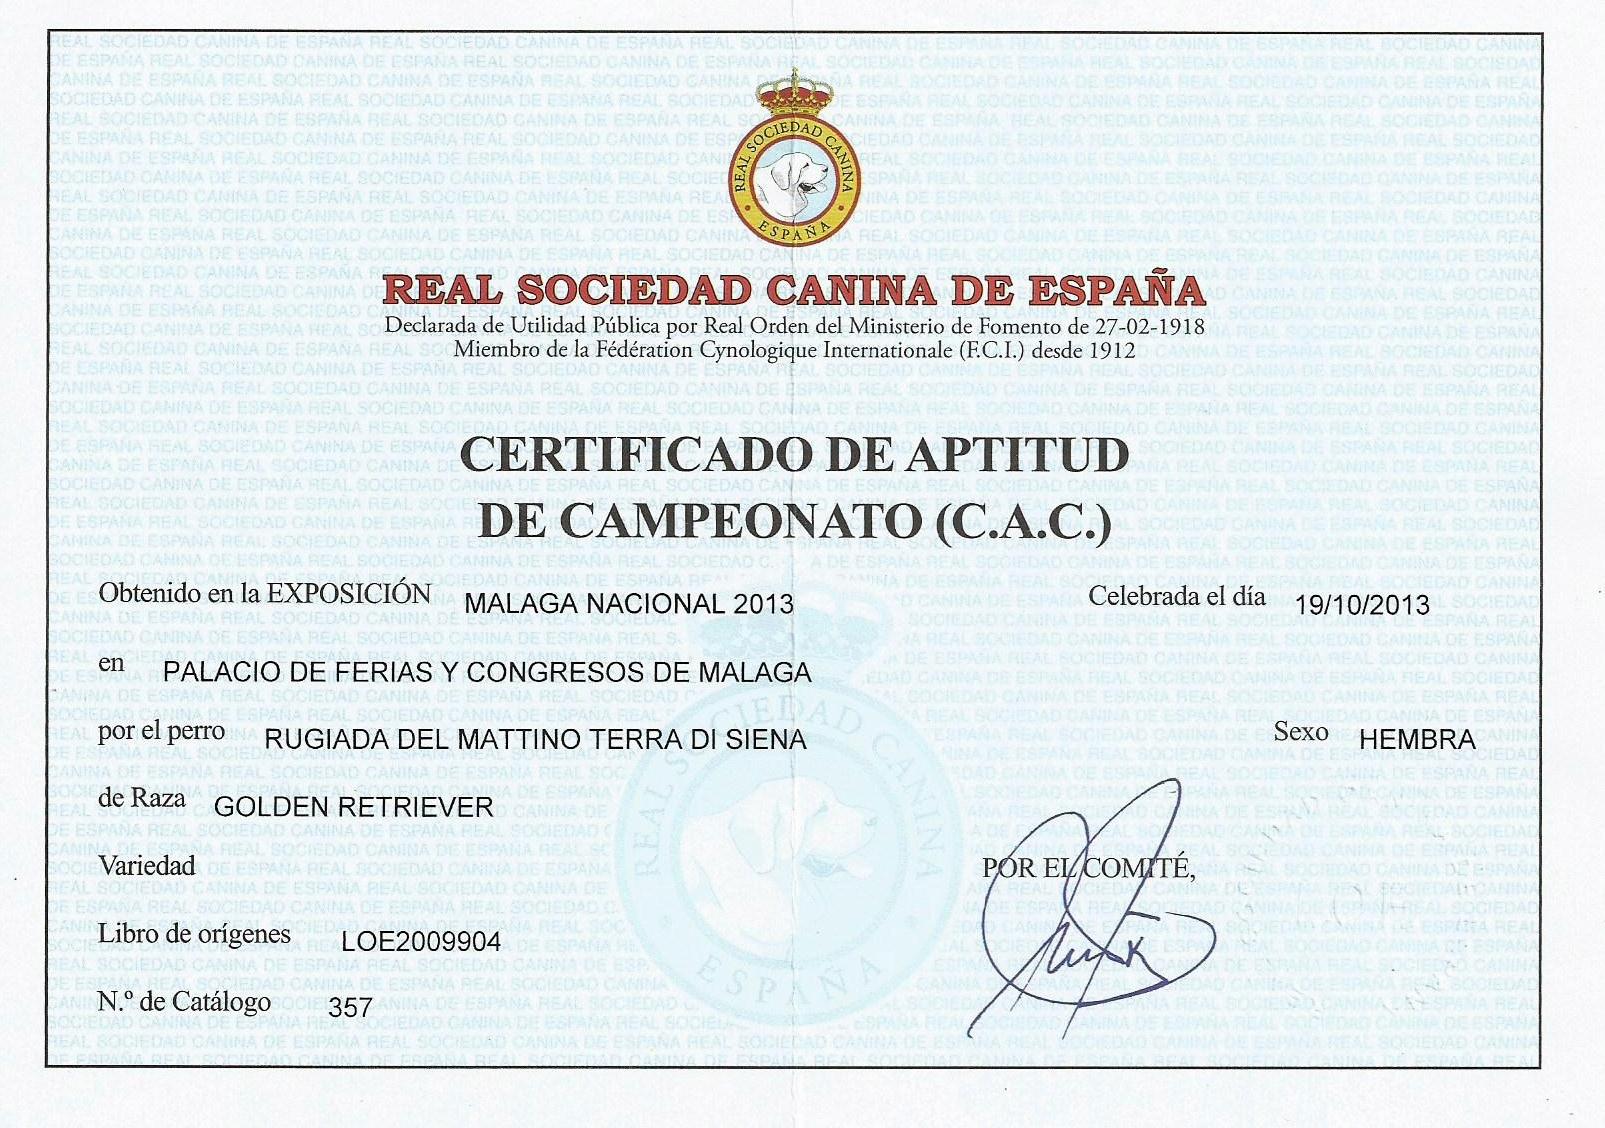 CAC JULIETTE MALAGA 2013